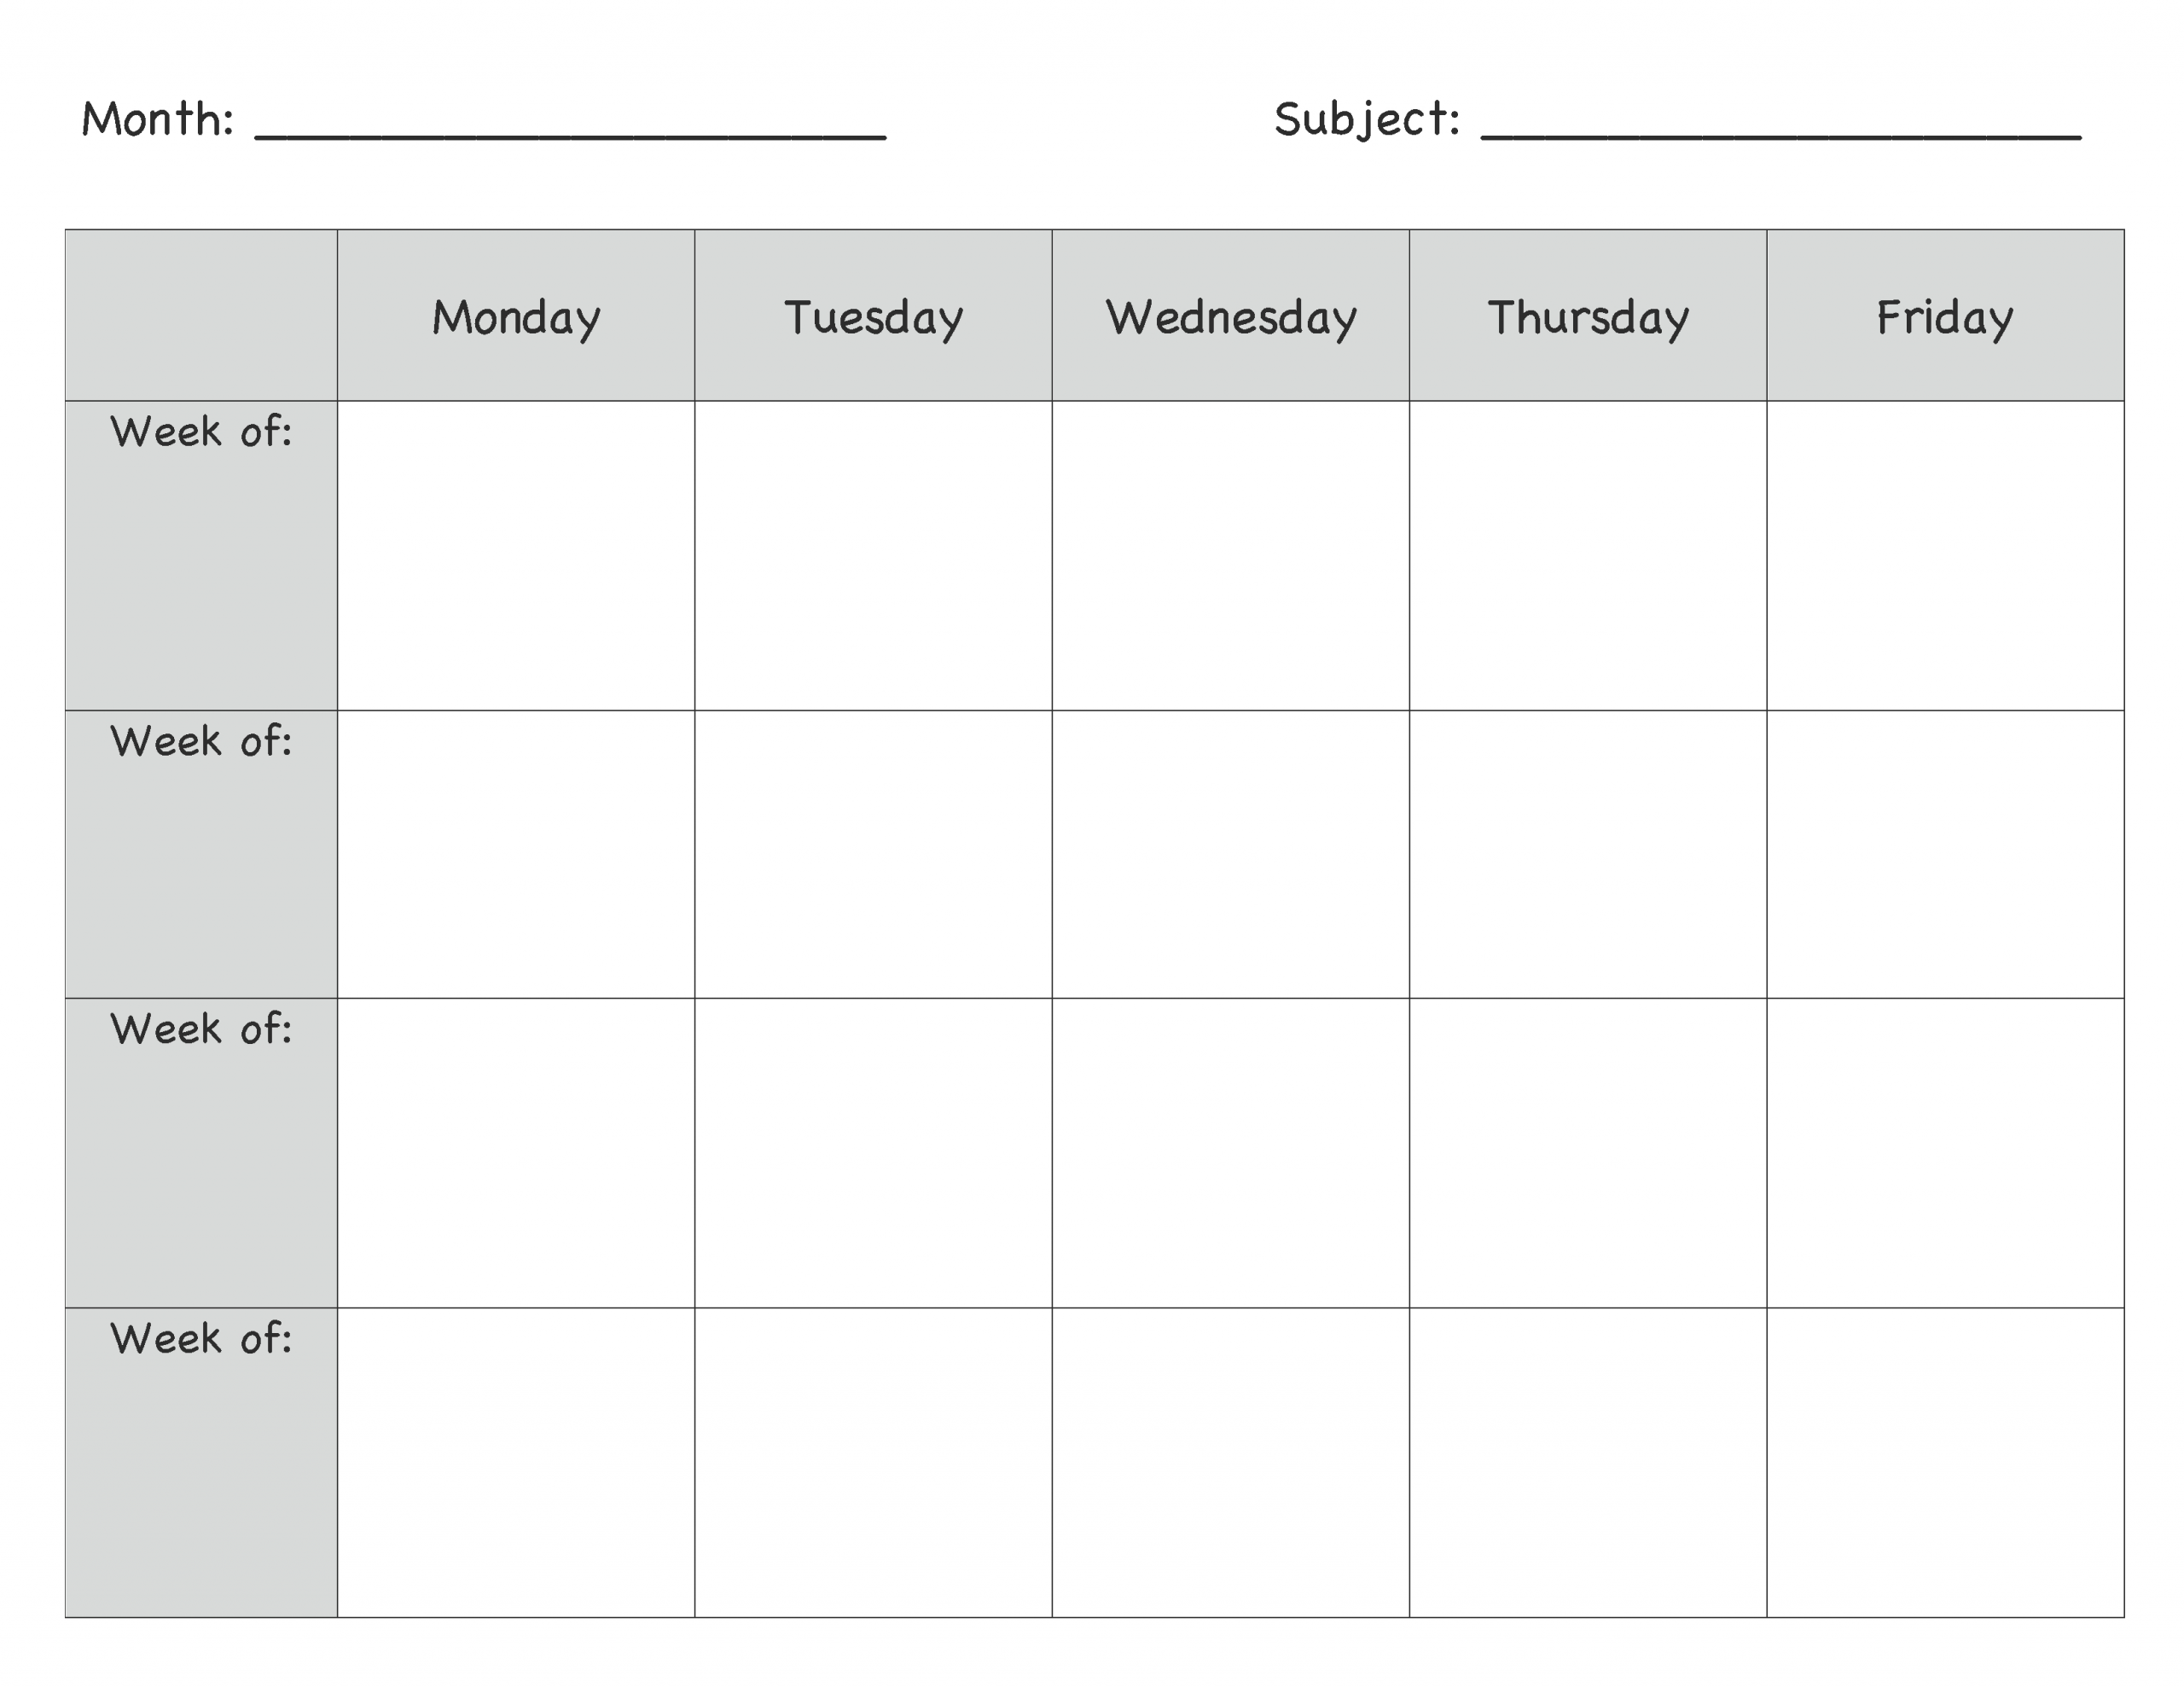 Monday Through Friday Planning Template | Calendar Monday Through Friday Printable